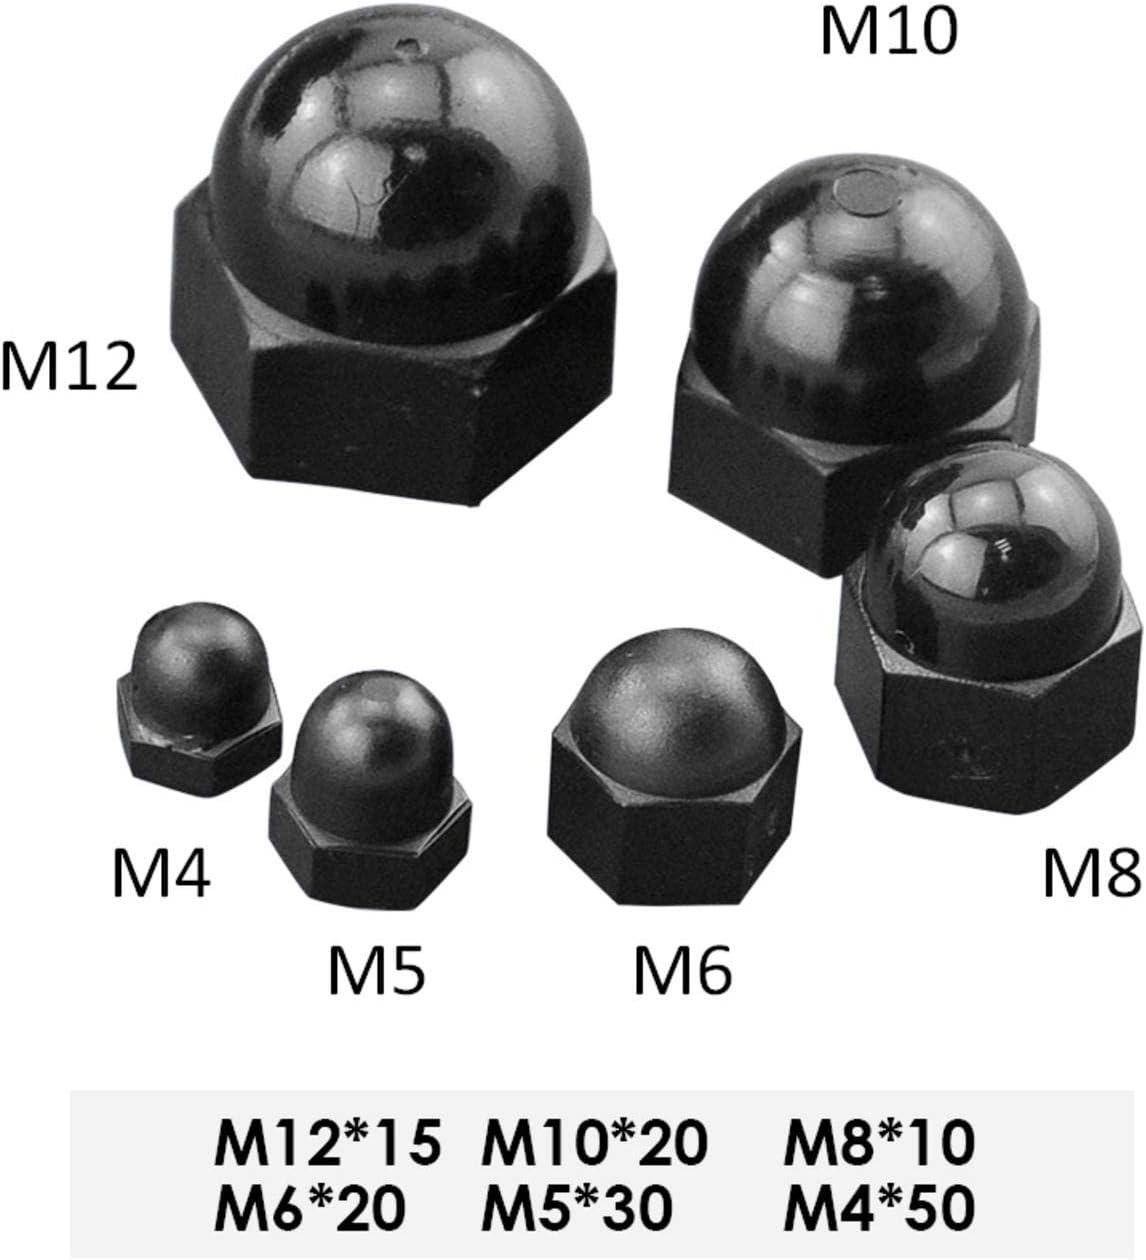 5 x copri dado in plastica nera vite auto M4 M5 M6 M8 M10 M12 M14 M16 M20 M24 M30